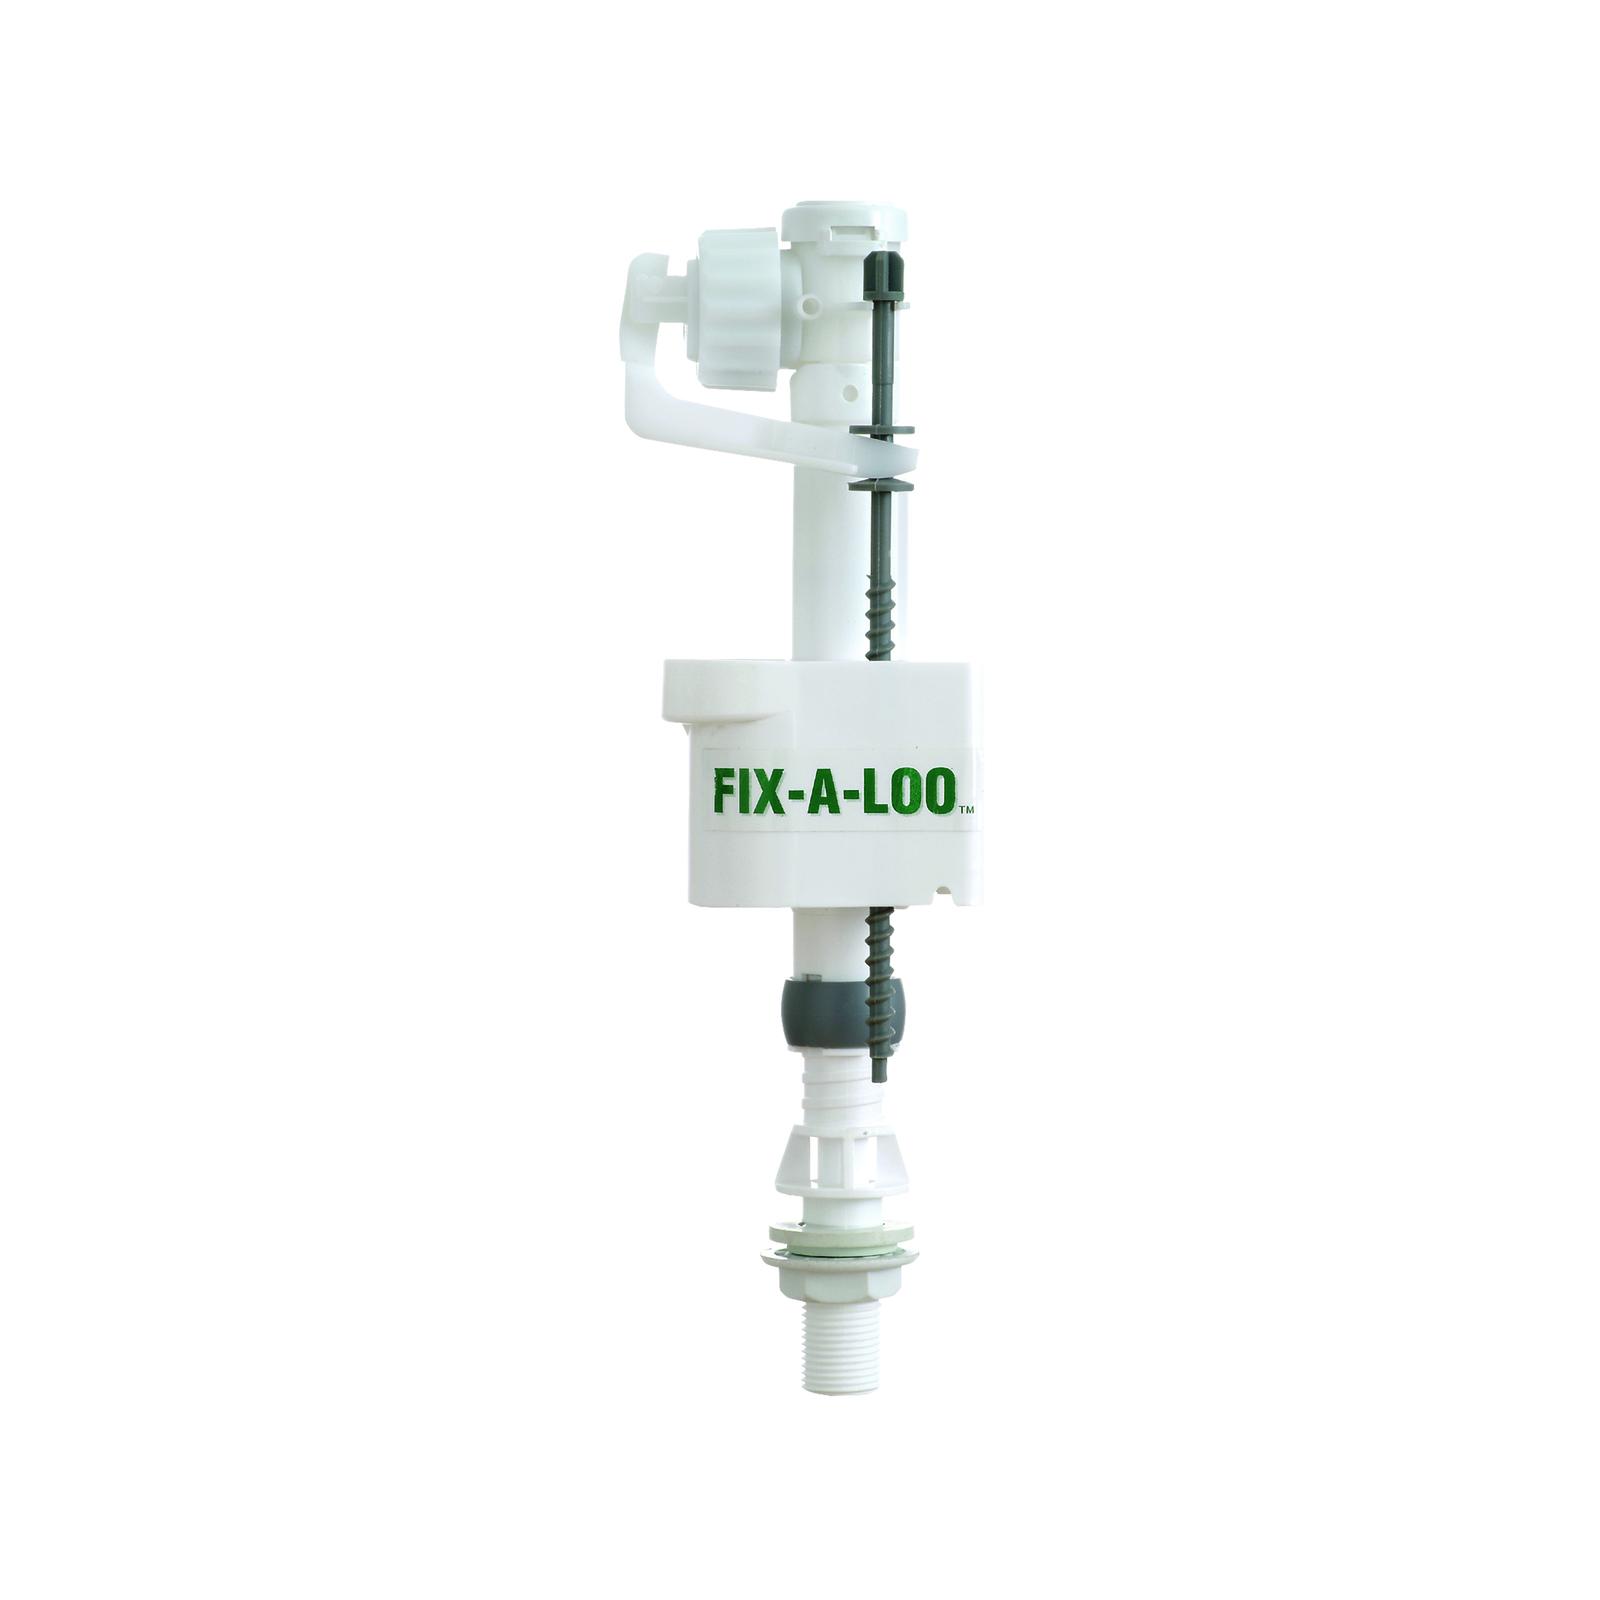 FIX-A-LOO Hush Flush Bottom Entry Cistern Inlet Valve